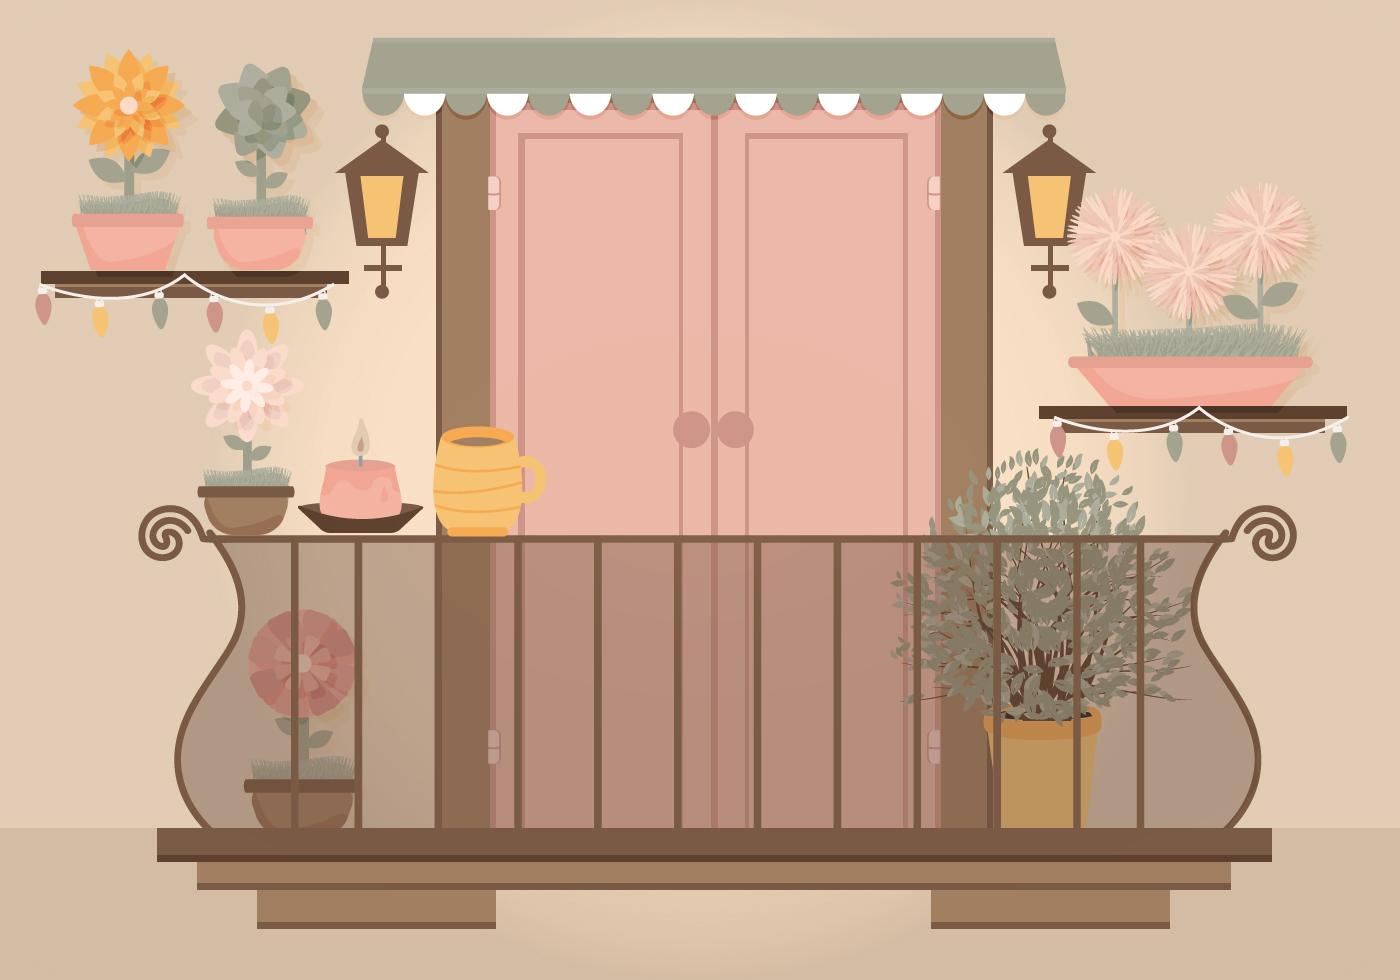 Vector pink door balcony illustration download free for Balcony clipart